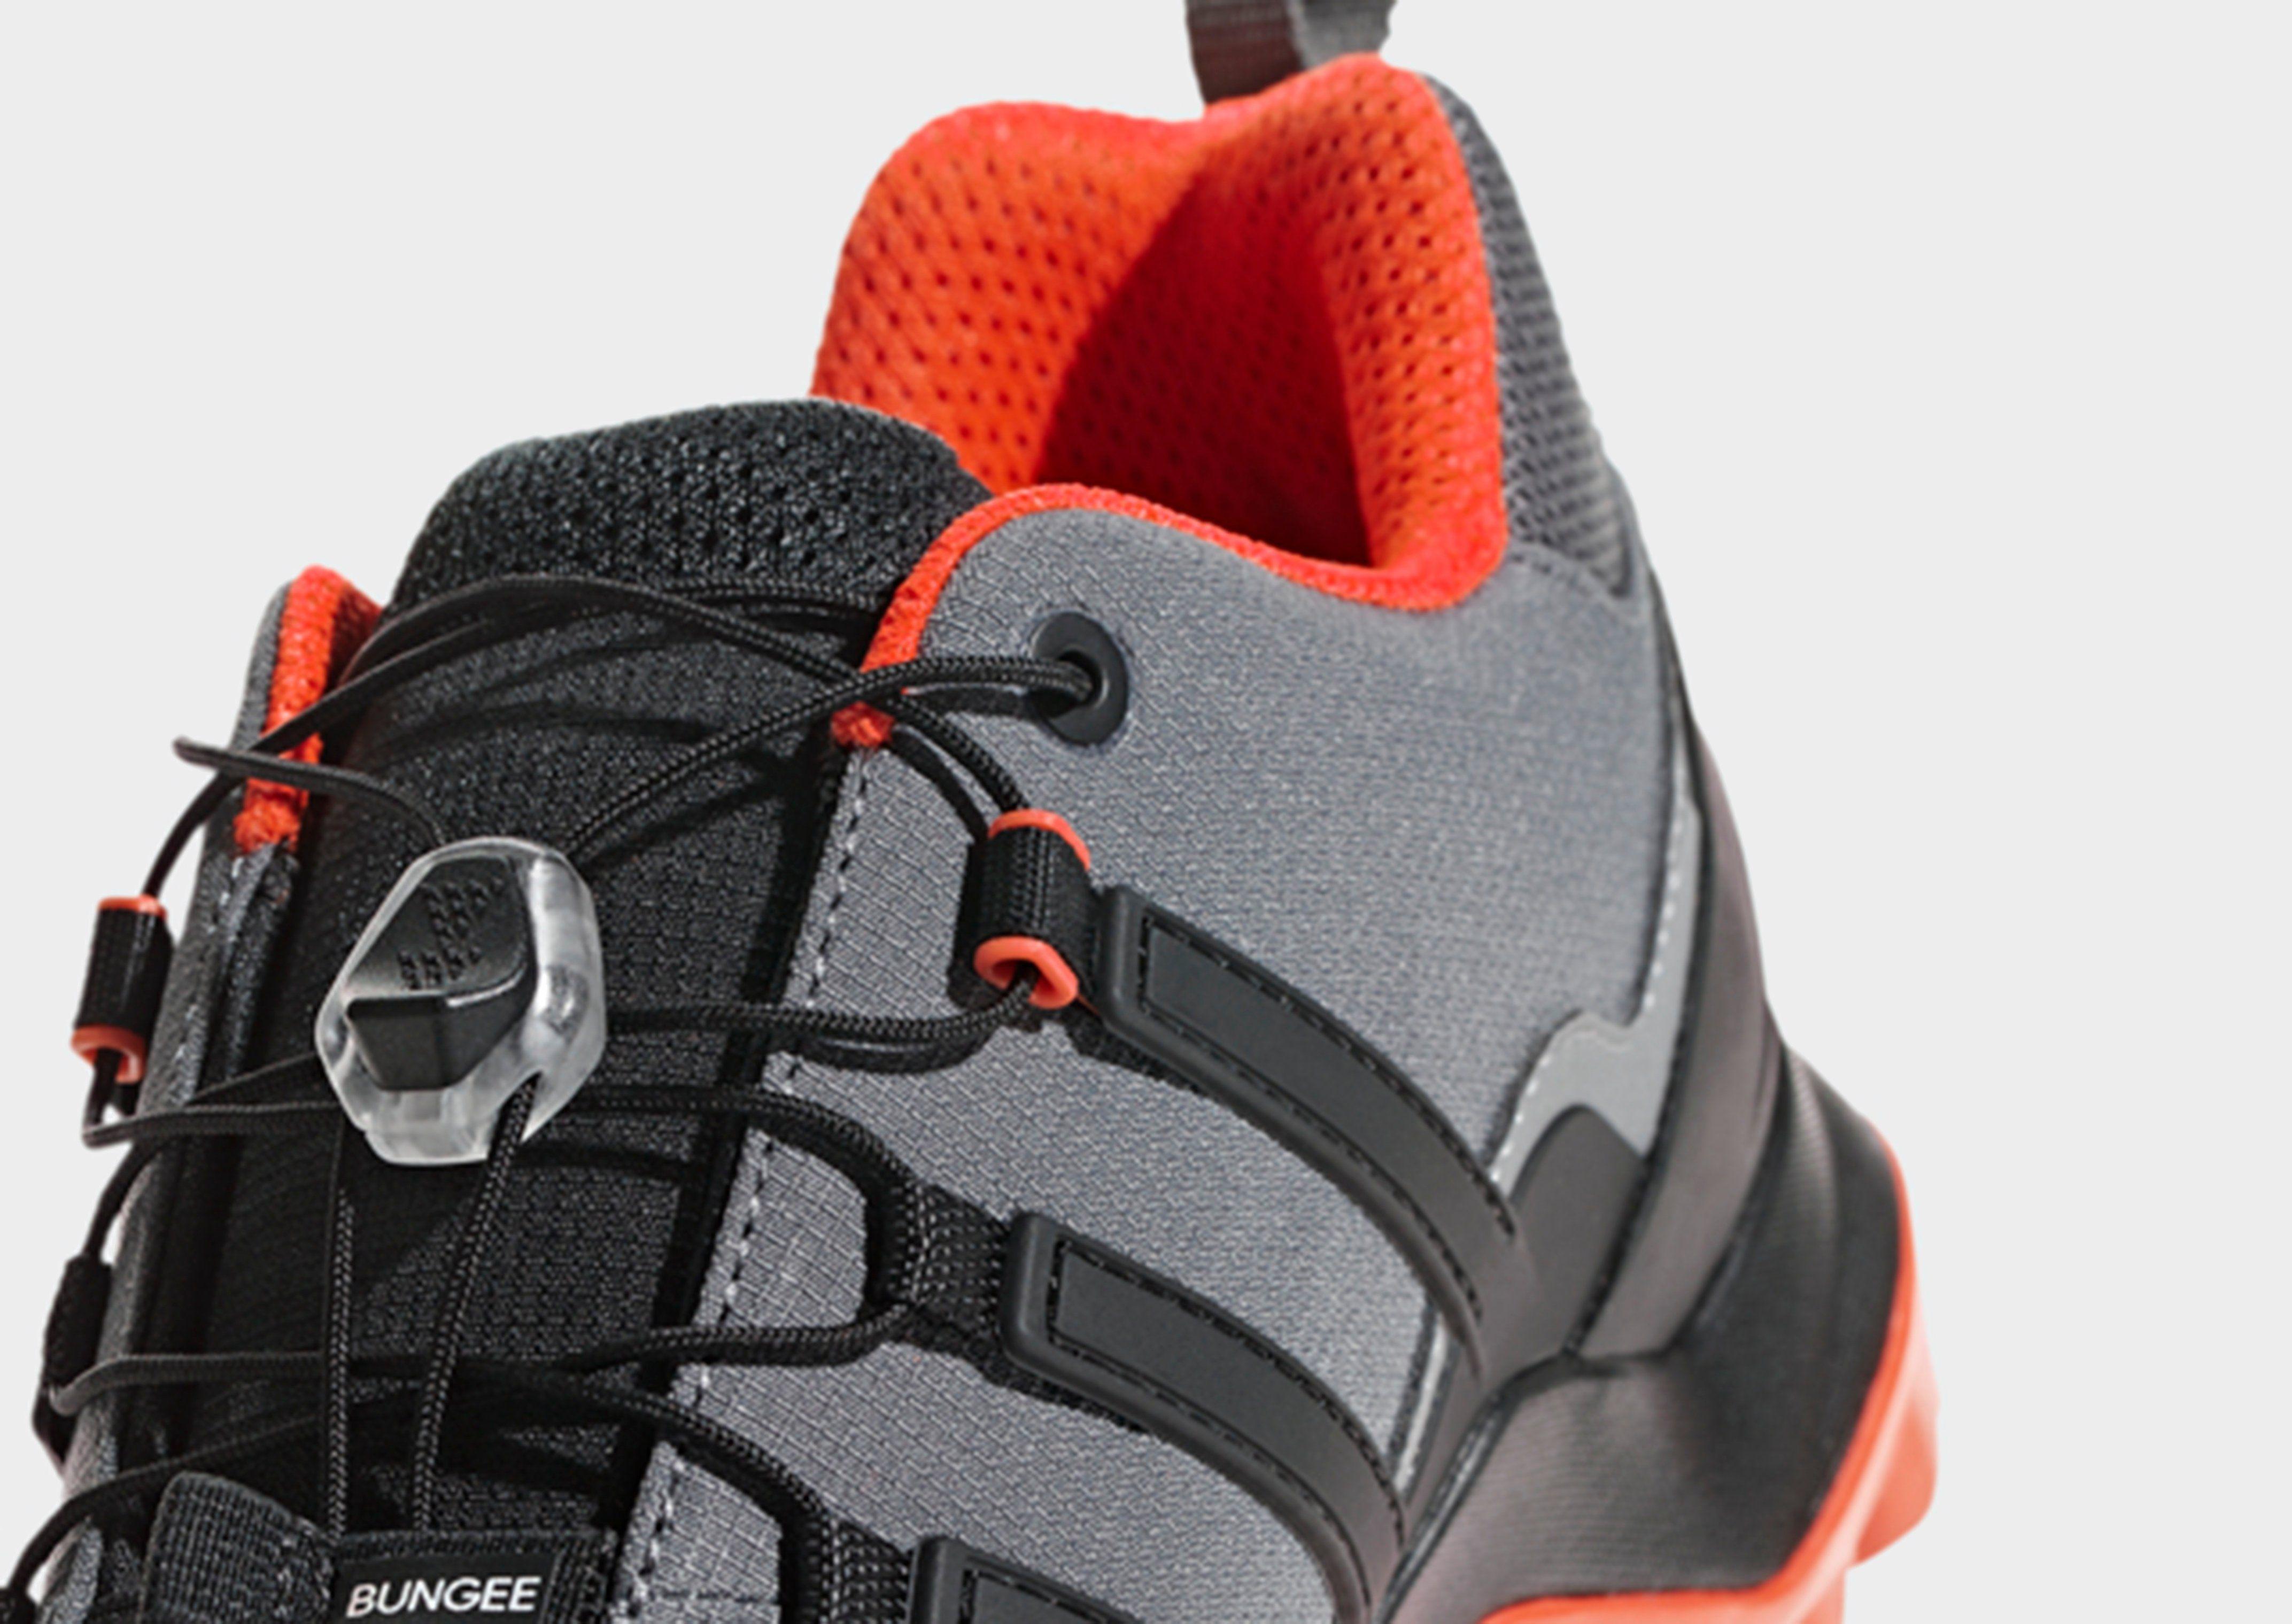 ADIDAS Terrex Swift R2 Shoes